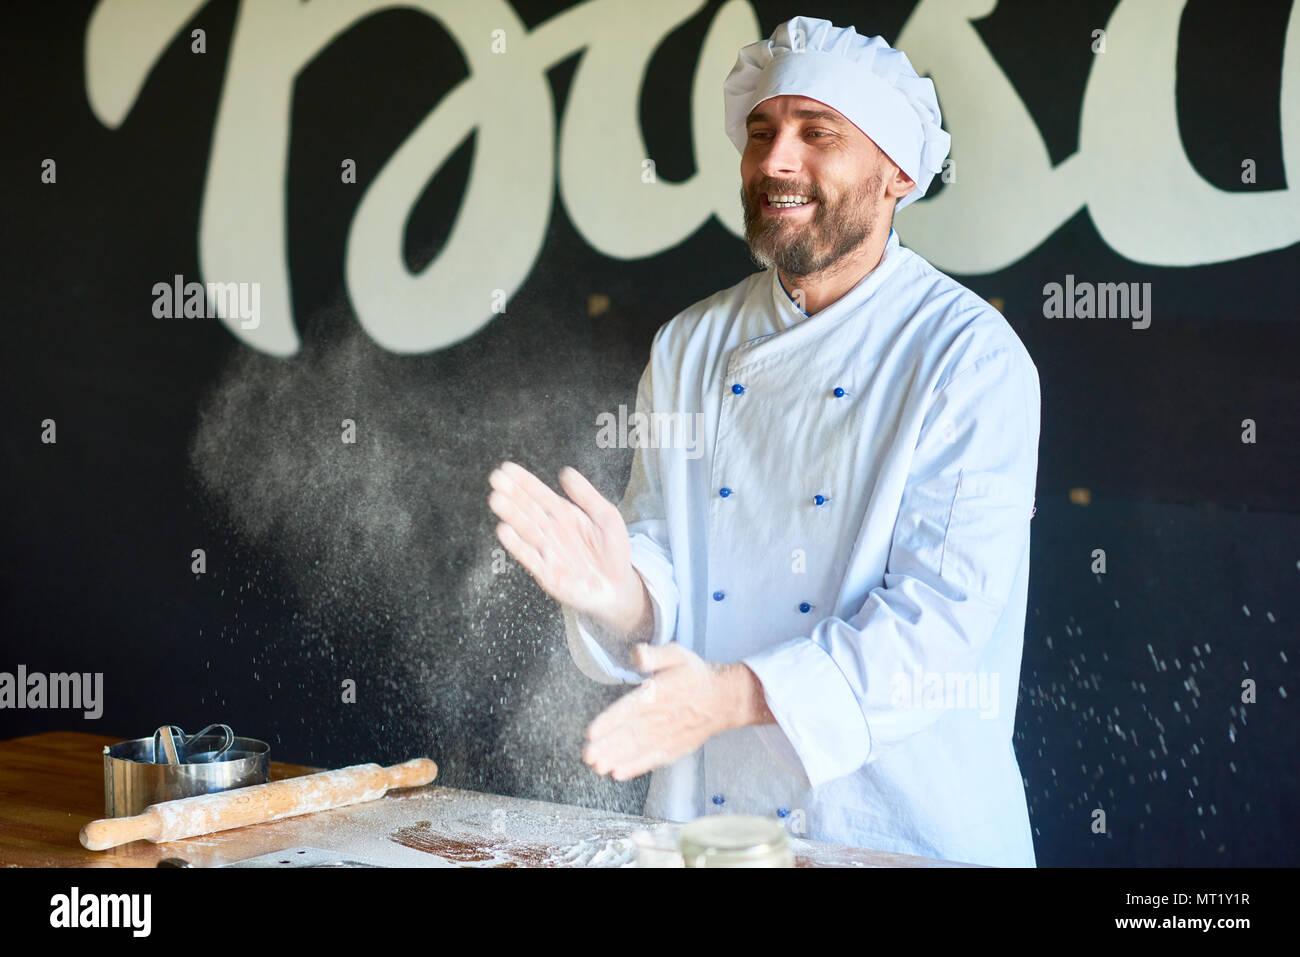 Baker en la cocina Imagen De Stock